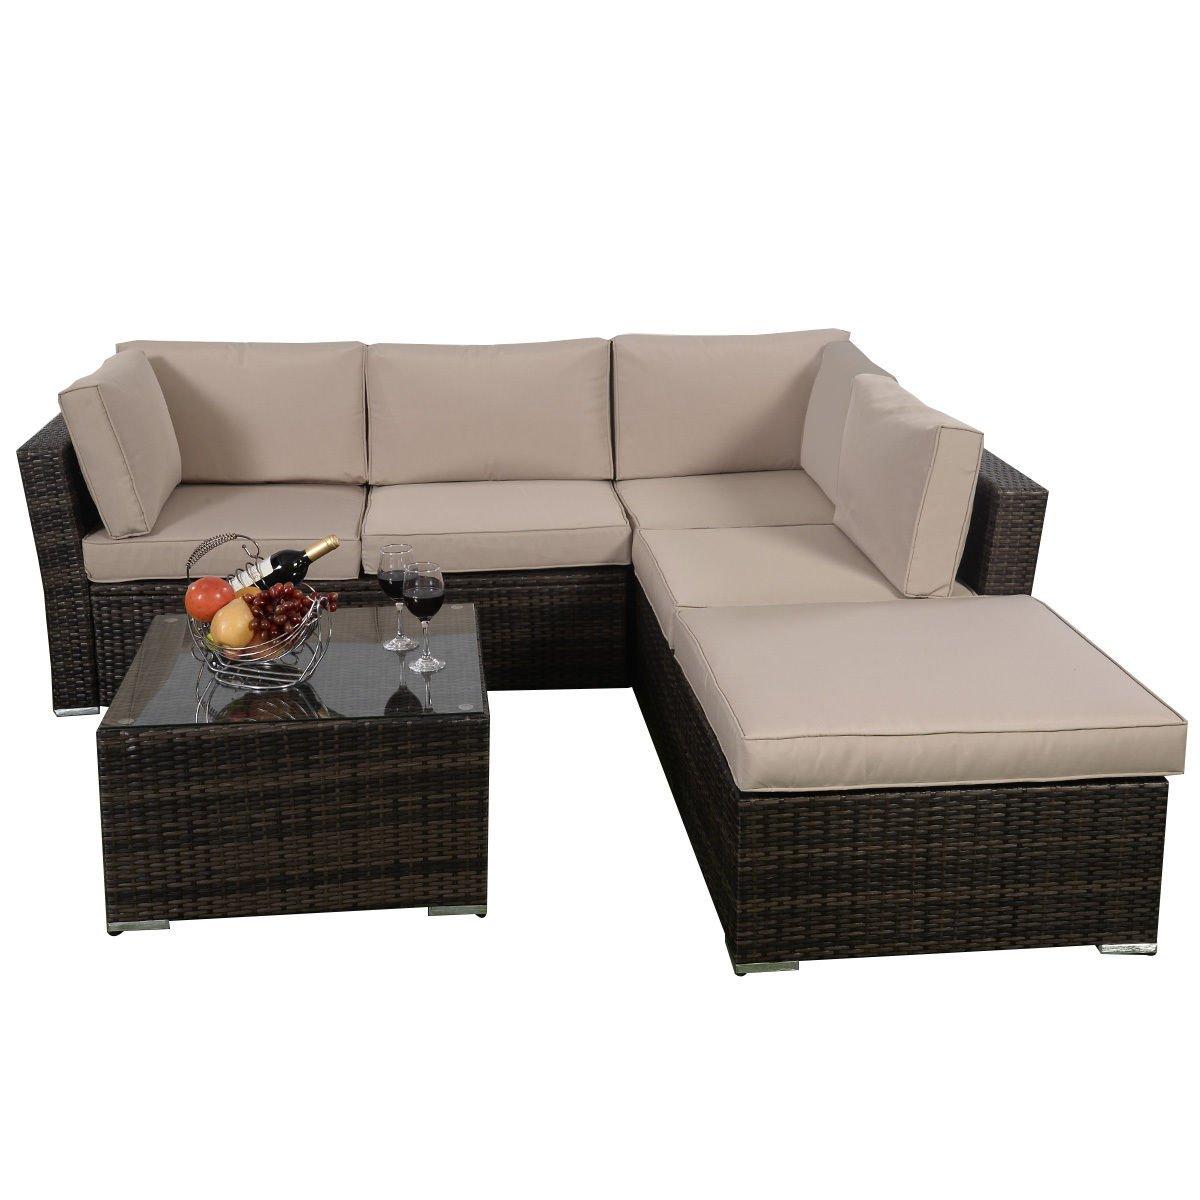 Giantex 4pc Patio Sectional Furniture Pe Wicker Rattan Sofa Set Deck Couch  Outdoor - Patio Sofas Amazon.com